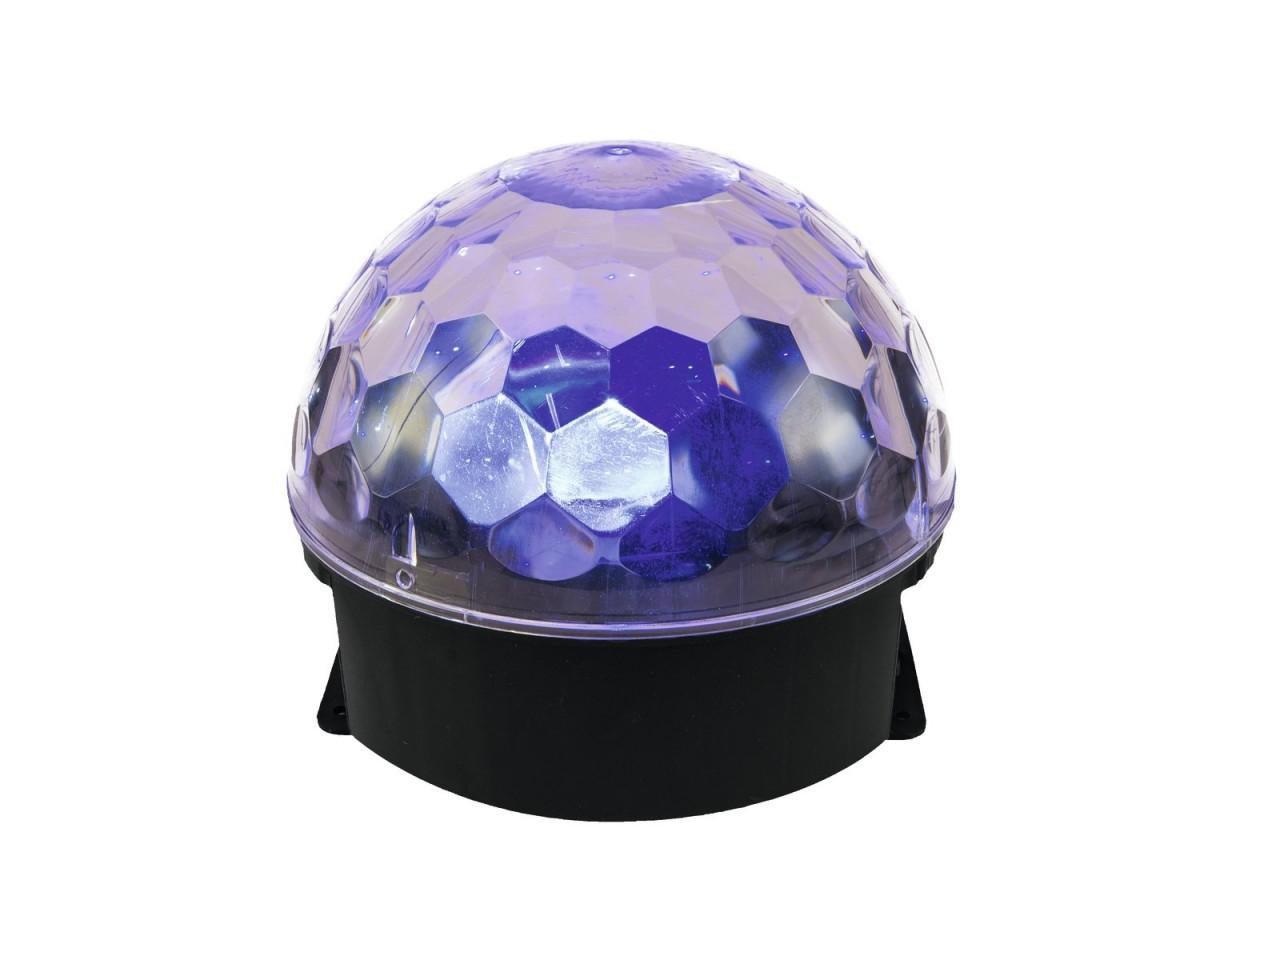 BC-4 Pilzkopf 6-farbig Diskokugel LED Effekt - RGBW + Orange +UV - drehend